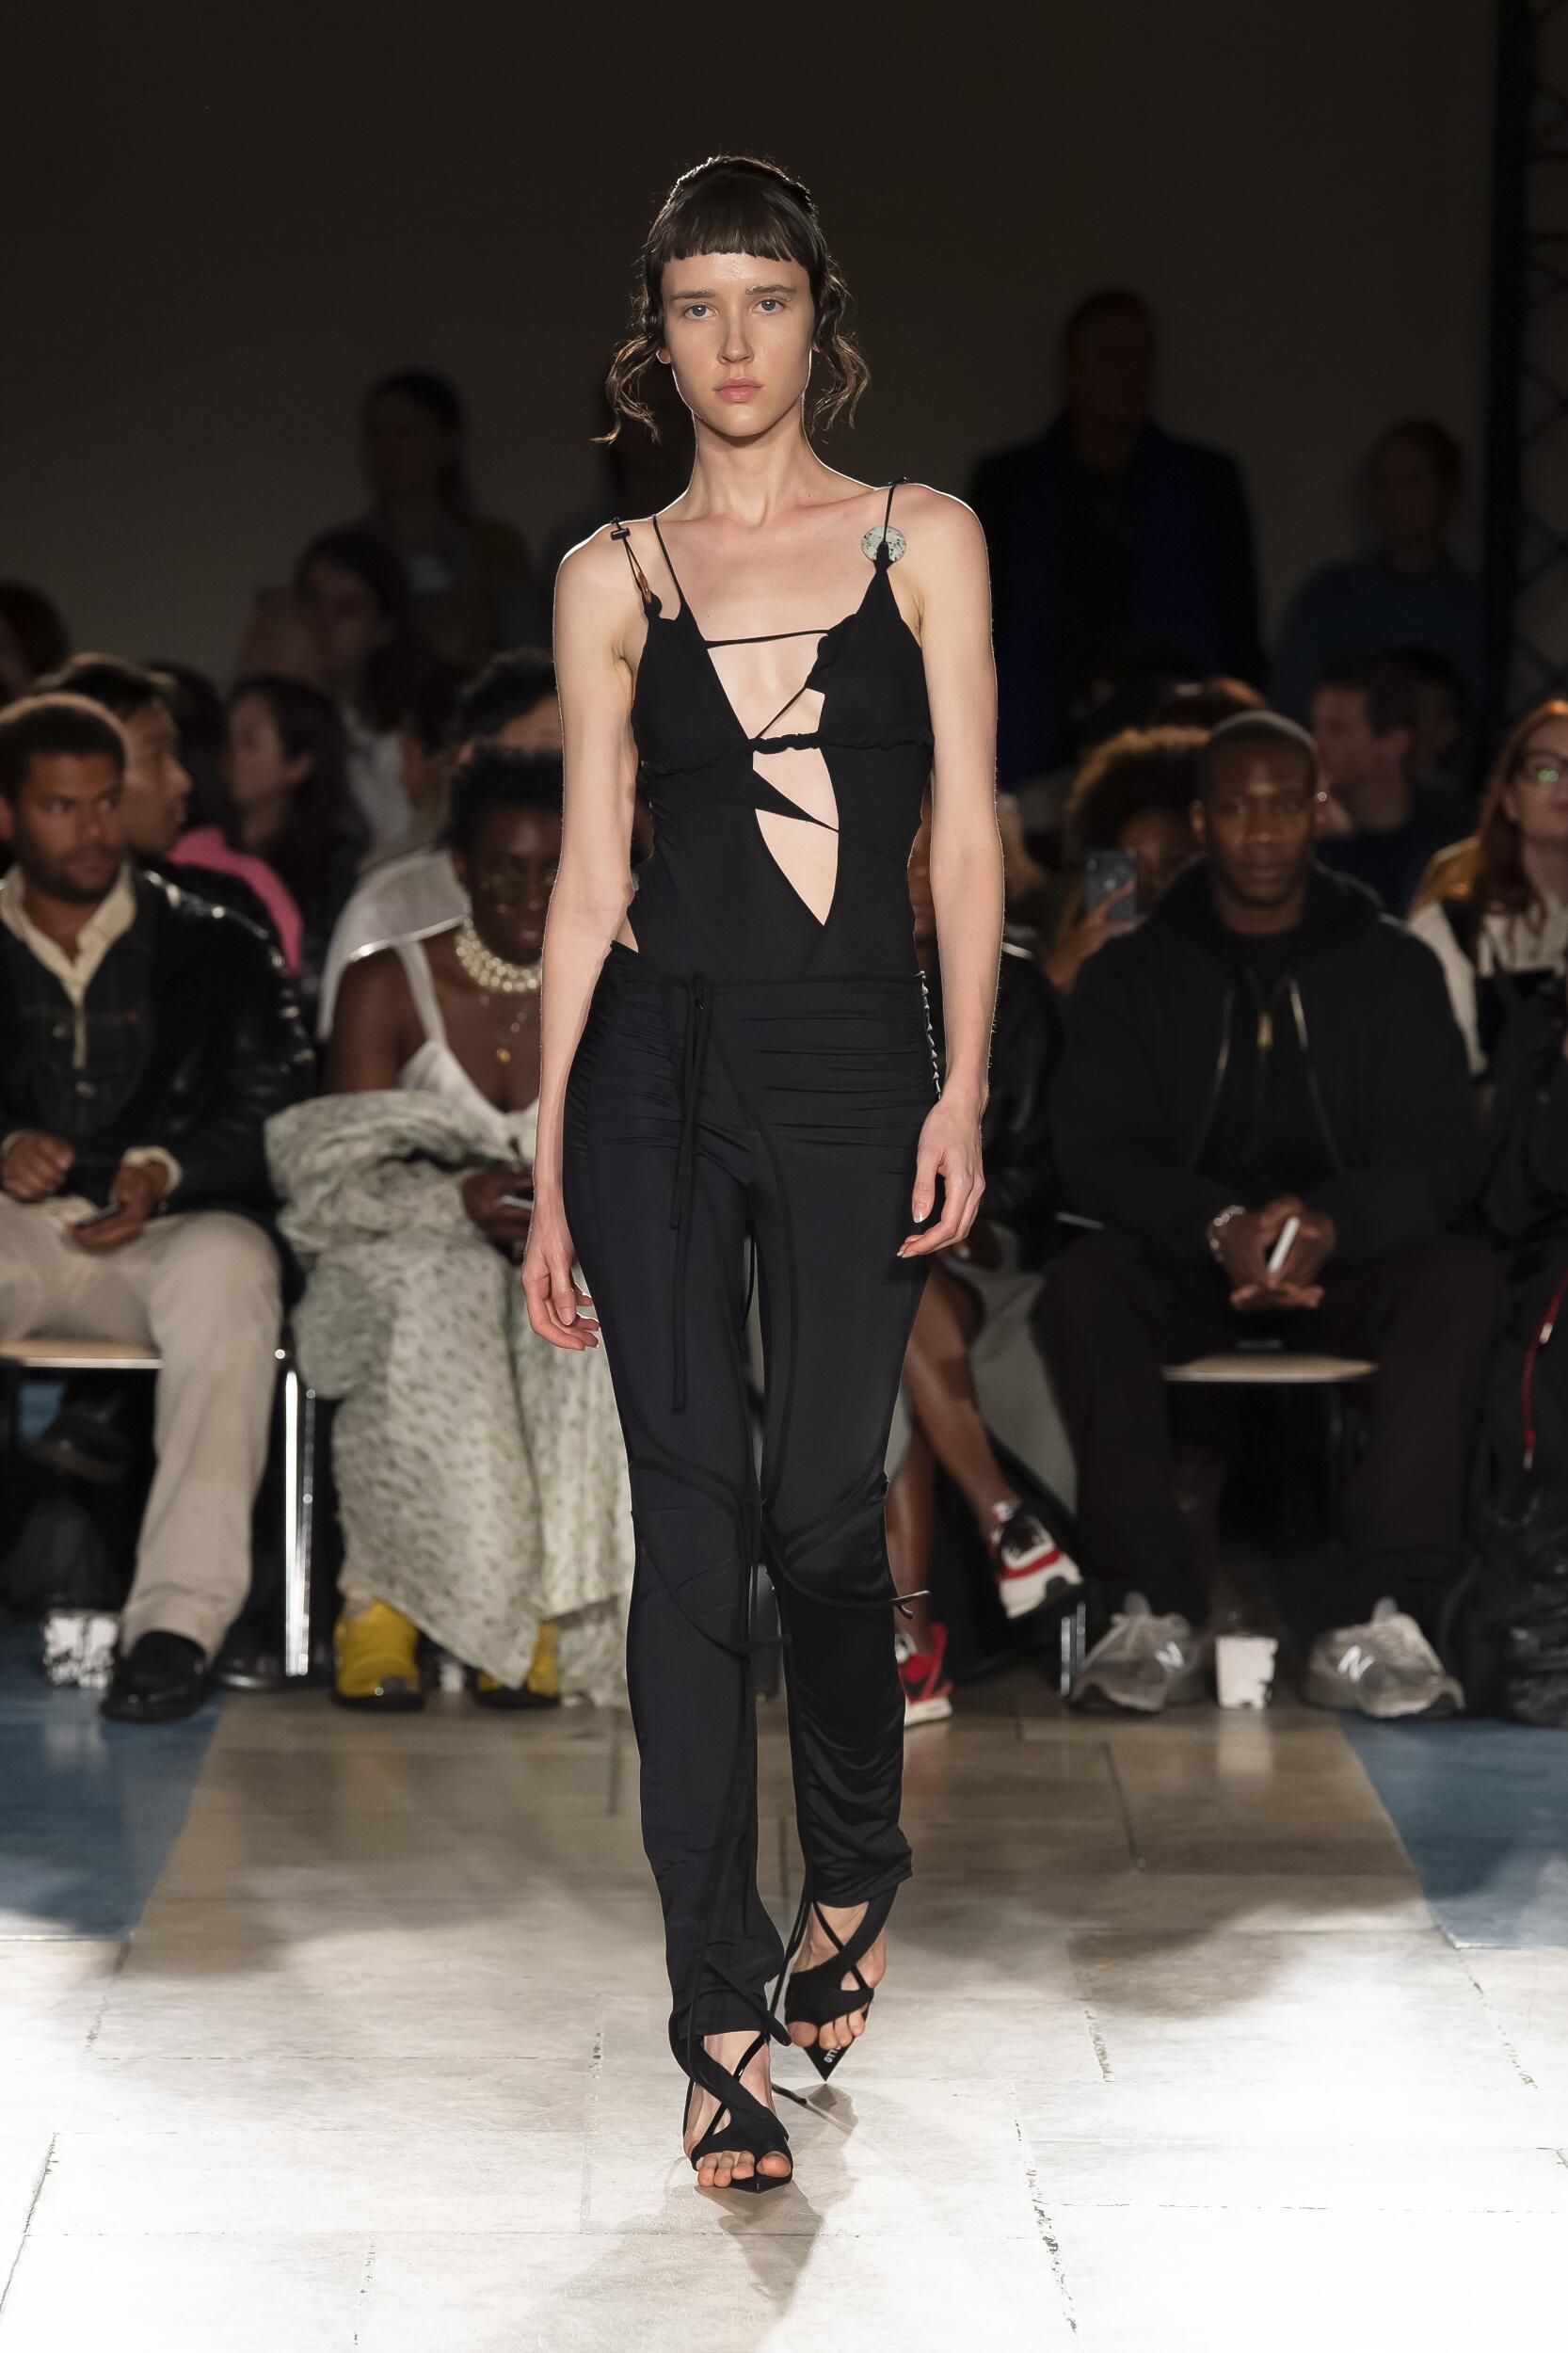 Fashion Model Woman Ottolinger Catwalk